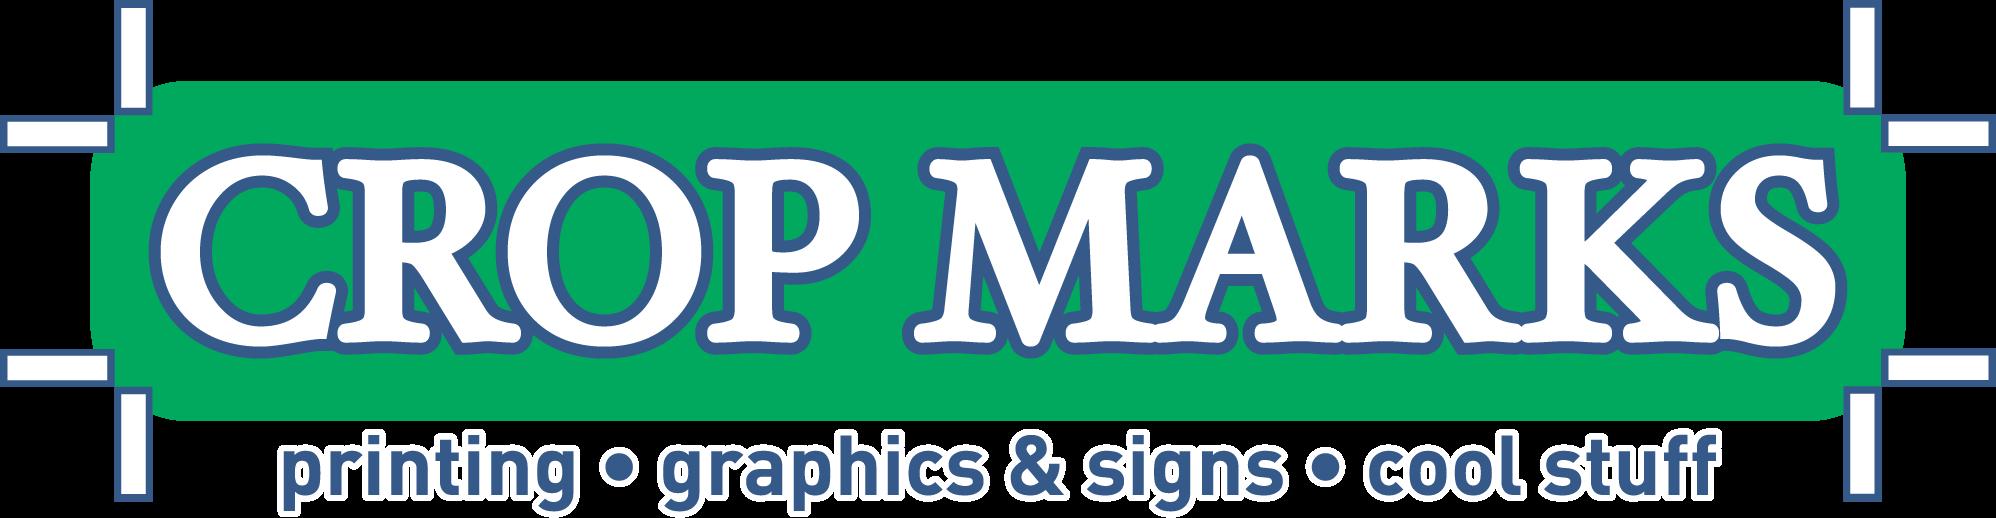 CropMarks logo